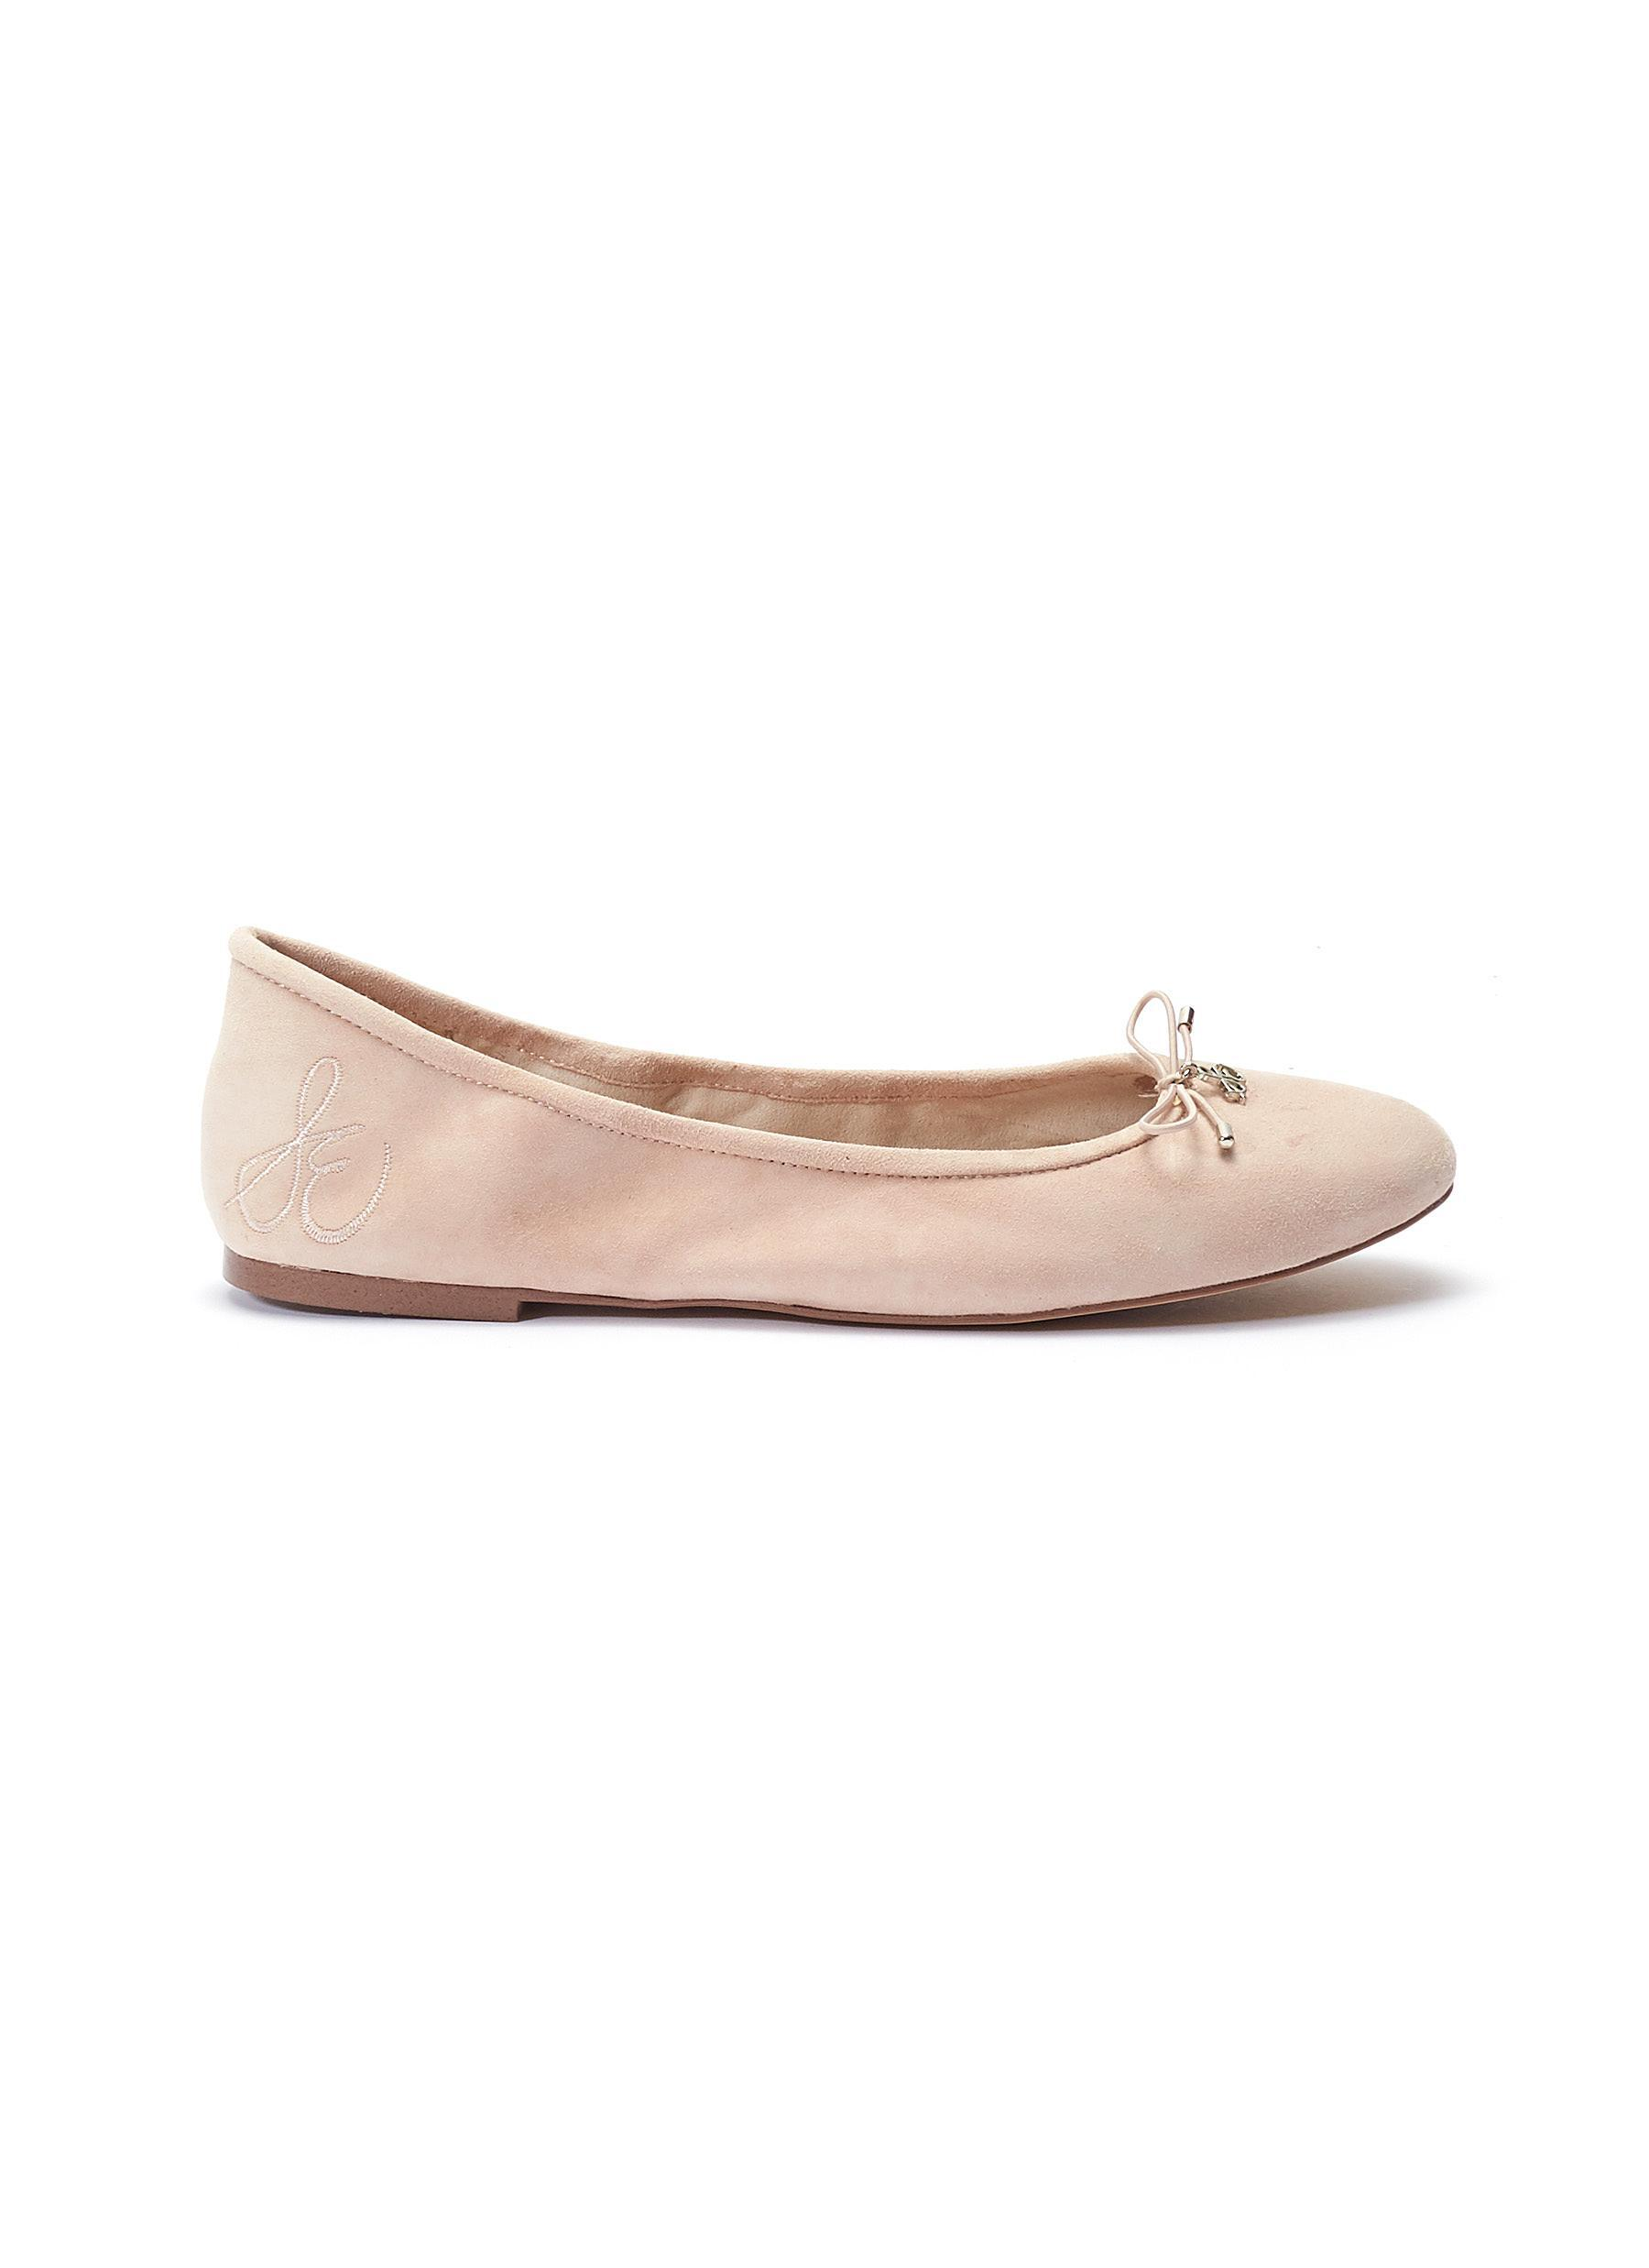 e14b9d1a8c2d96 Lyst - Sam Edelman  felicia  Suede Ballet Flats in Pink